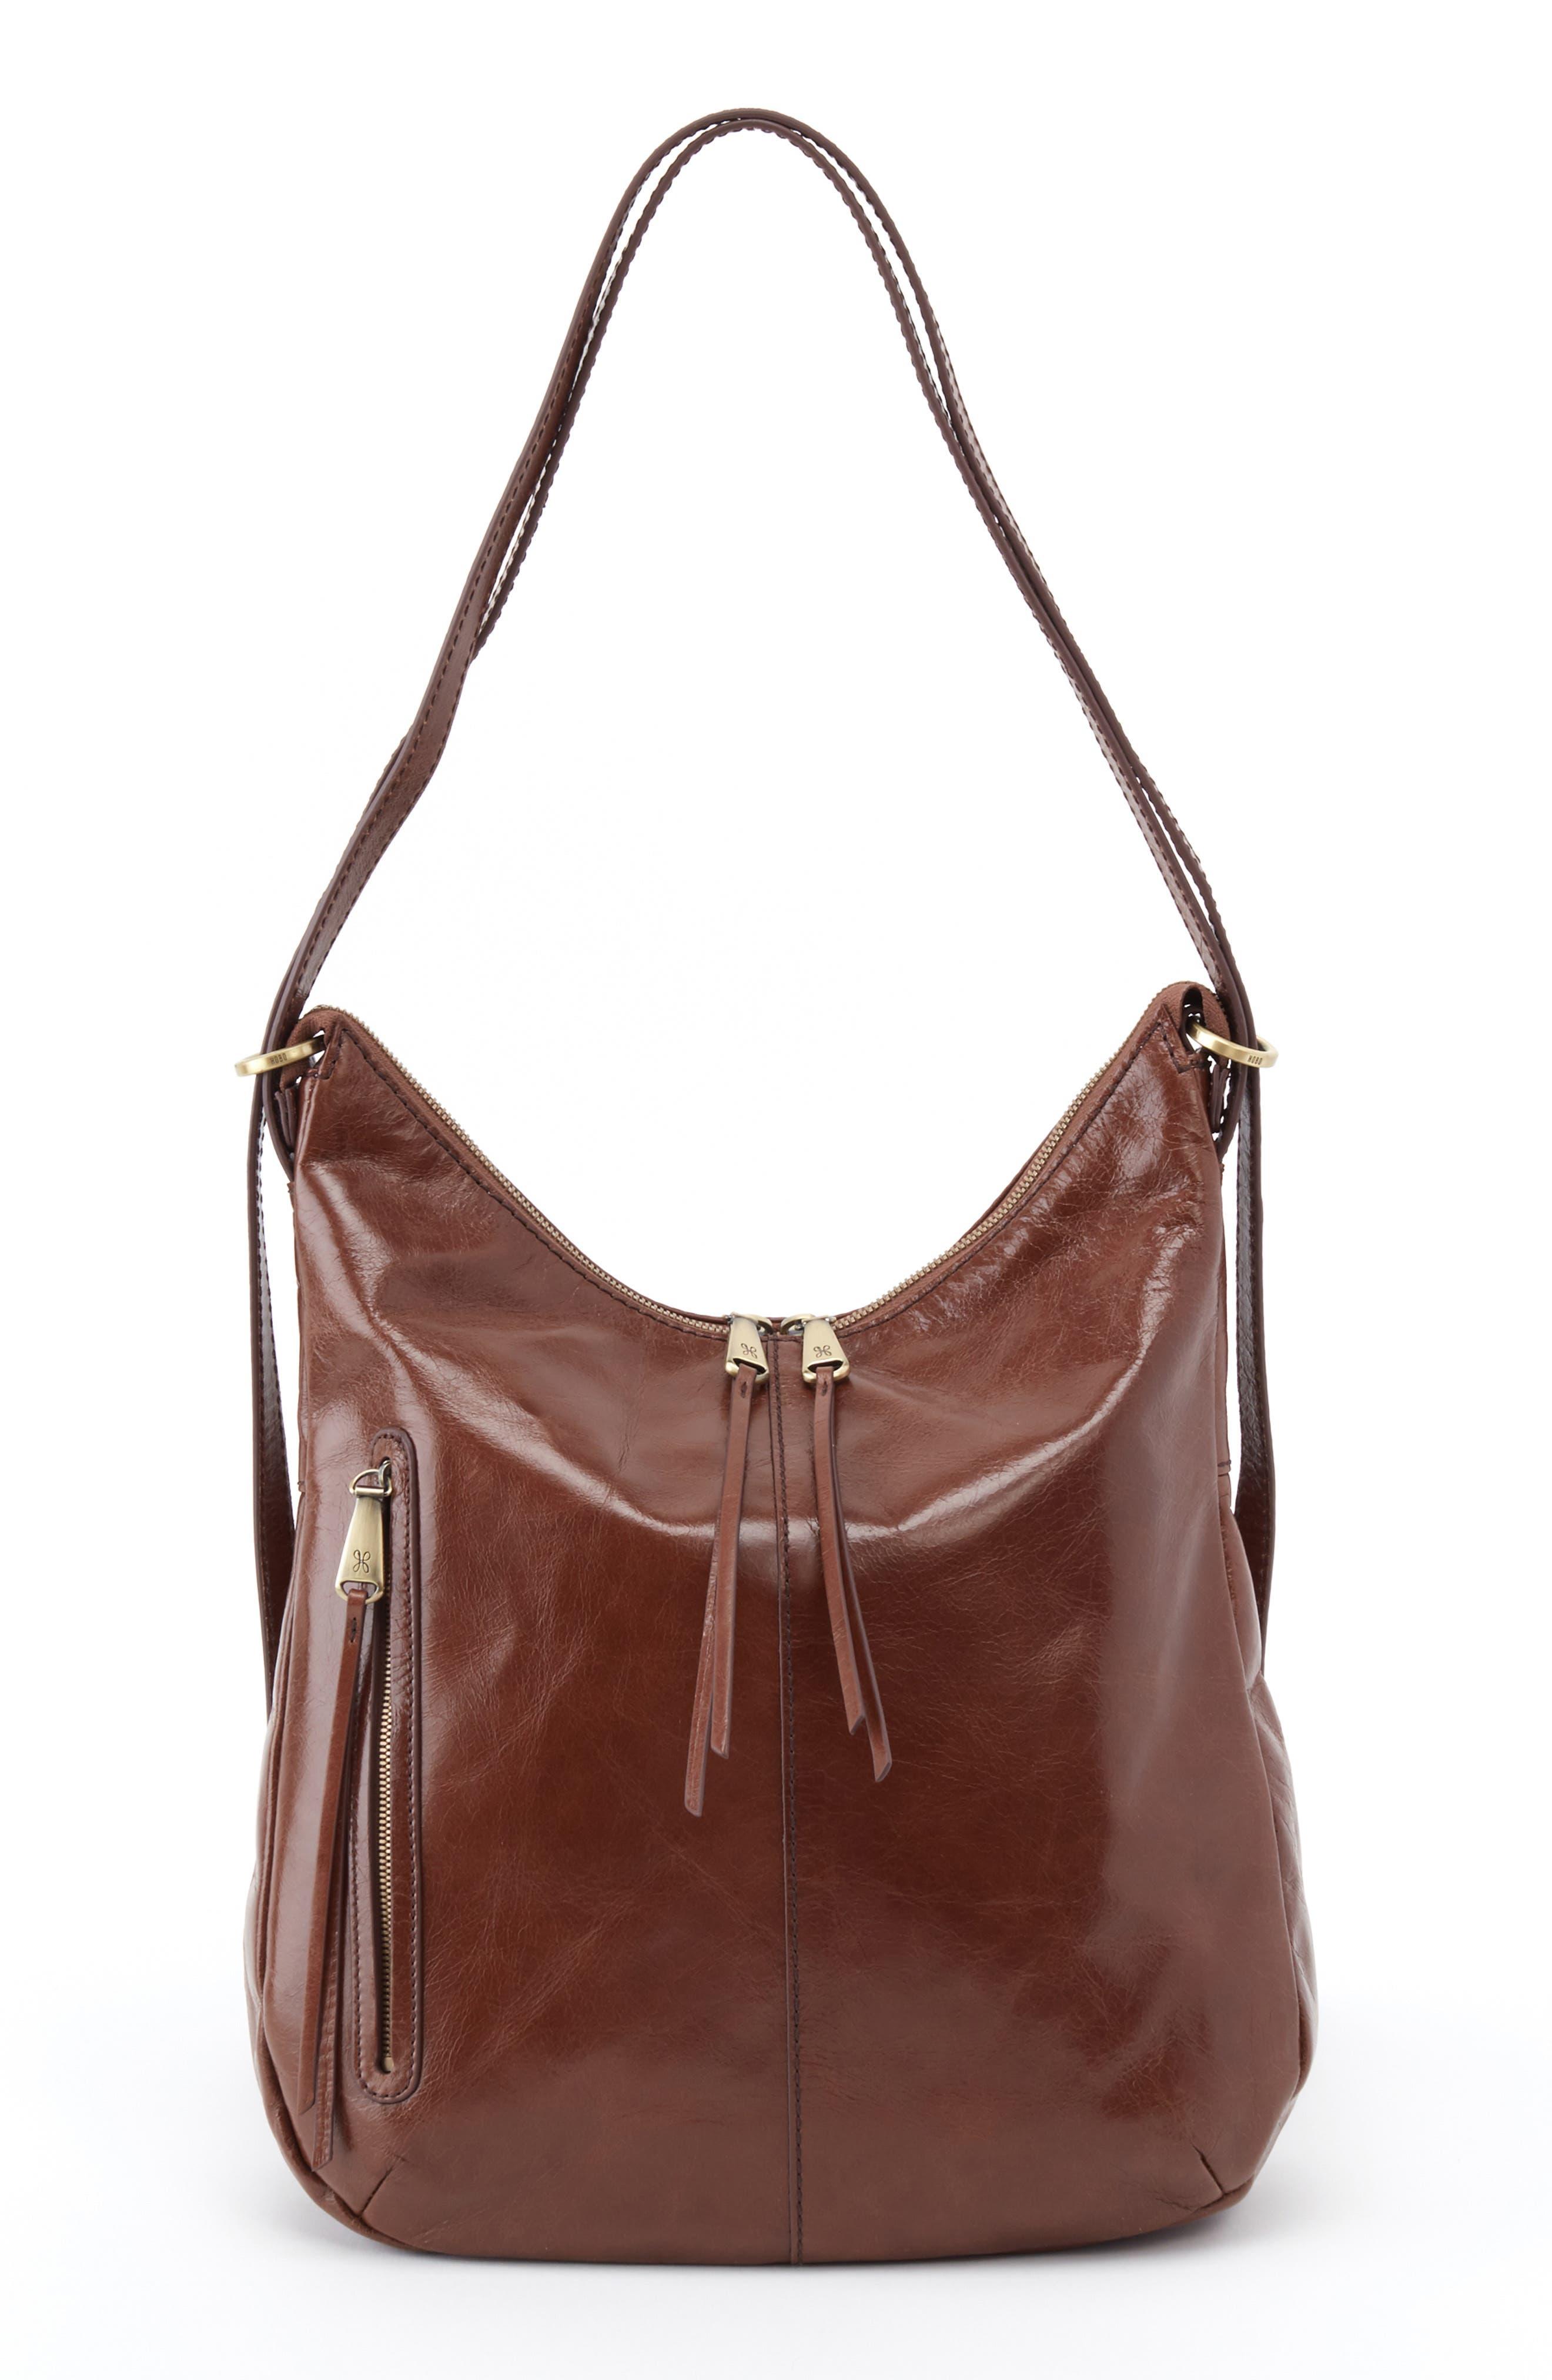 hobo international handbags for women  4a48e91a70d63